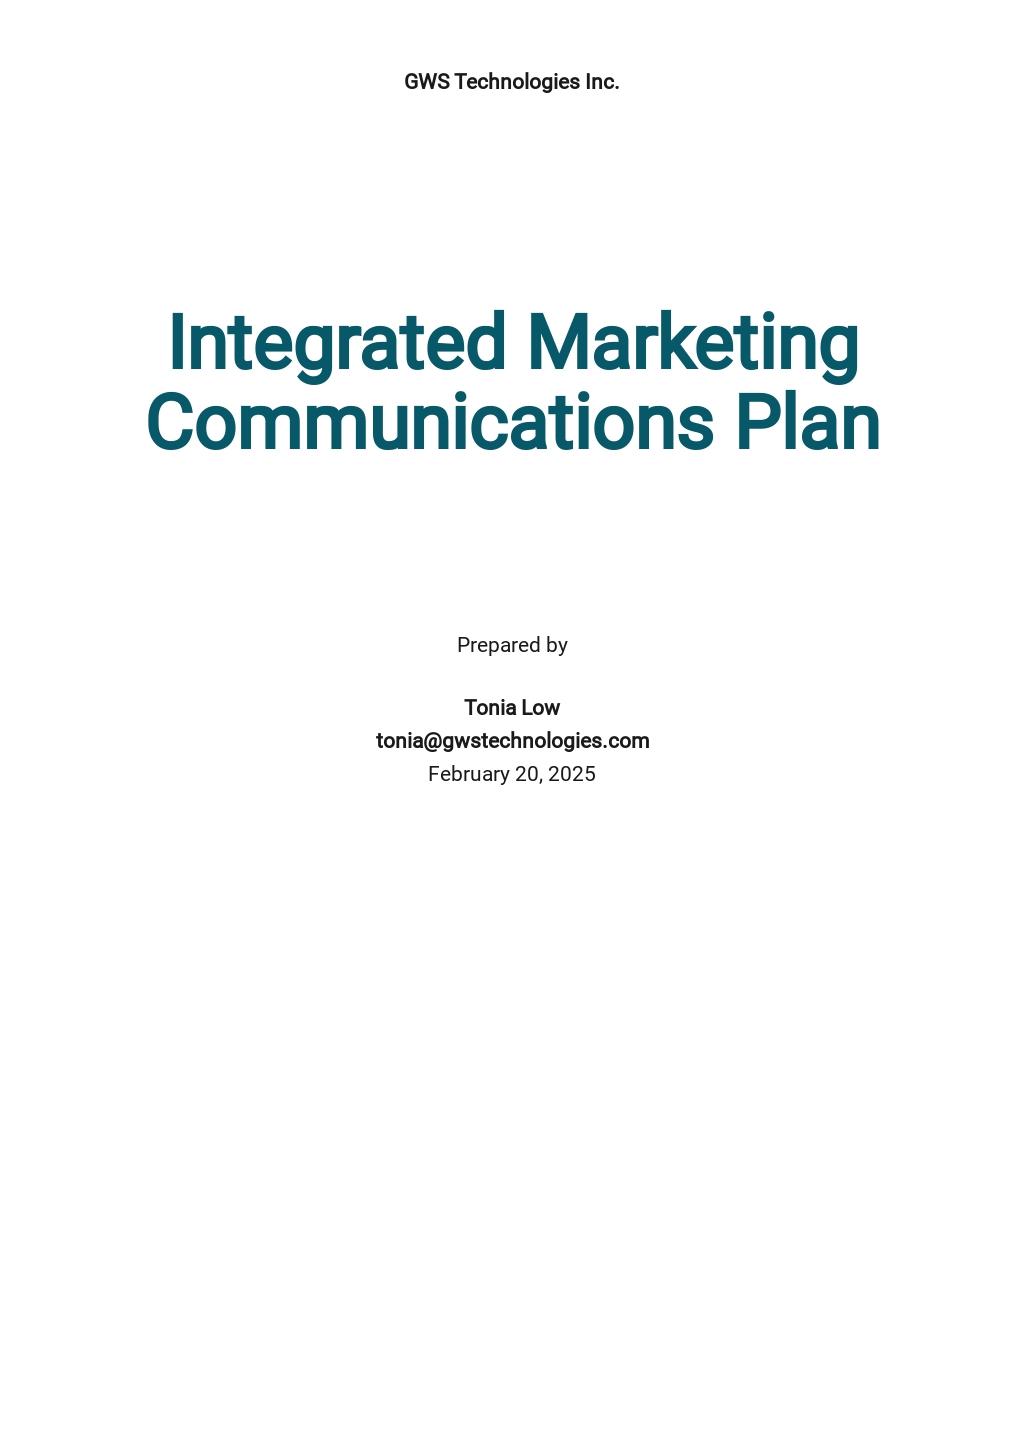 Integrated Marketing Communications Plan Template.jpe